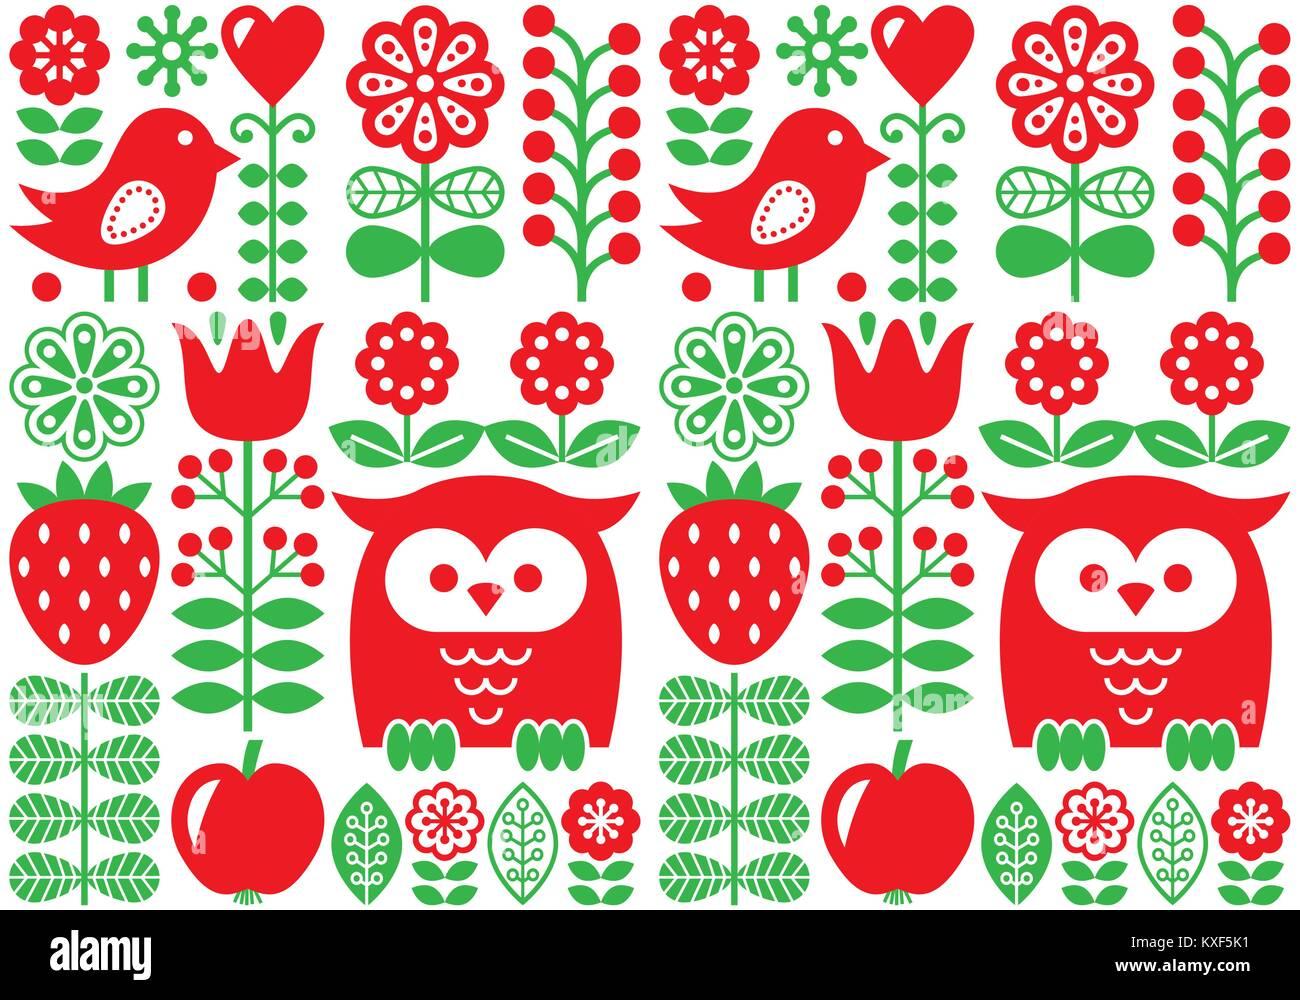 Finnish inspired seamless vector folk art pattern - Scandinavian design, Nordic wallpaper with flowers and birds - Stock Vector